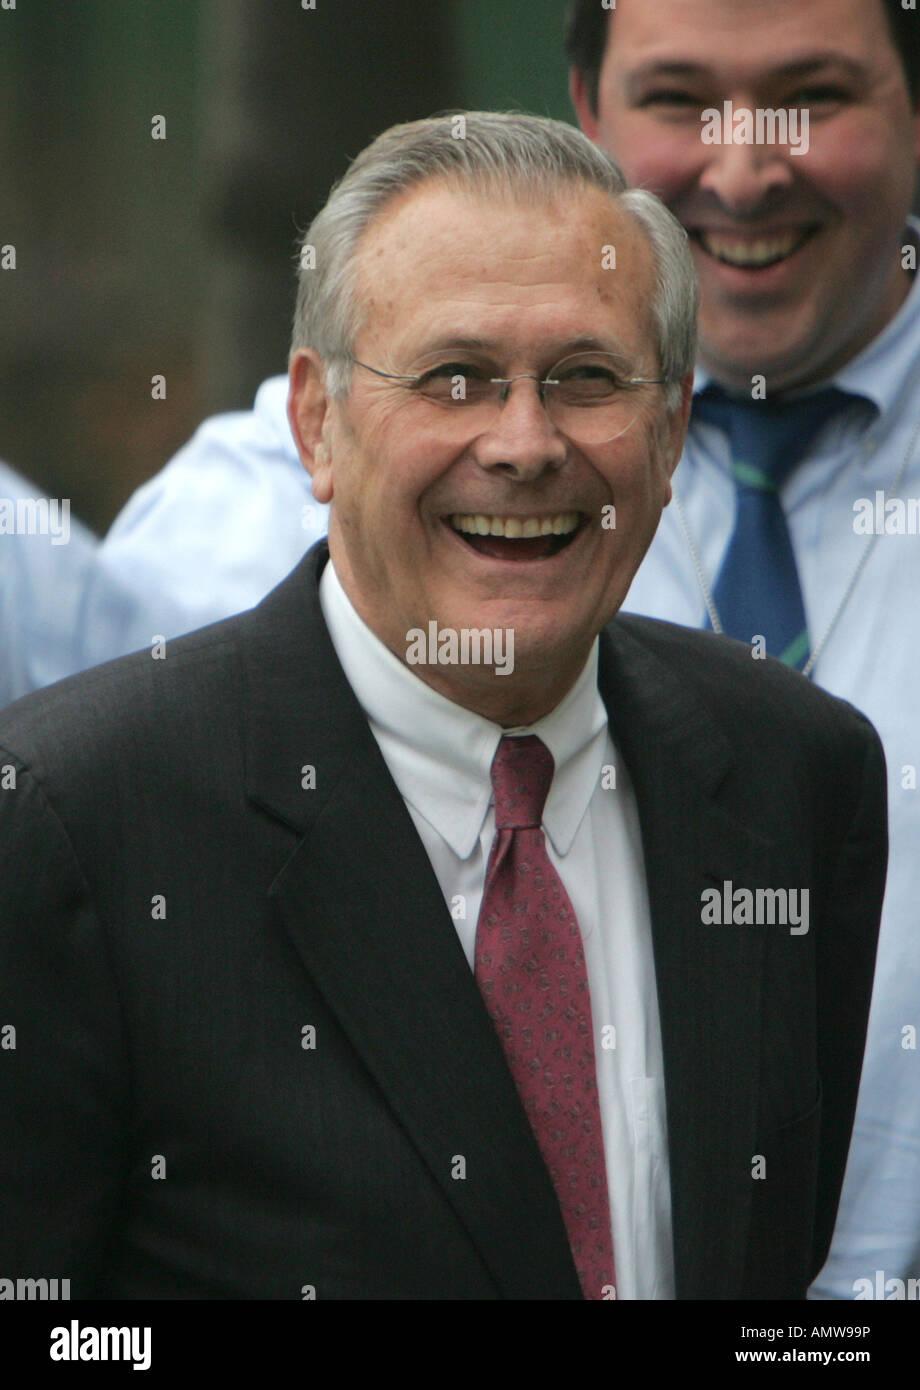 Secretary of Defense Donald Rumsfeld laughs as he departs the White House on November 8, 2006. - Stock Image